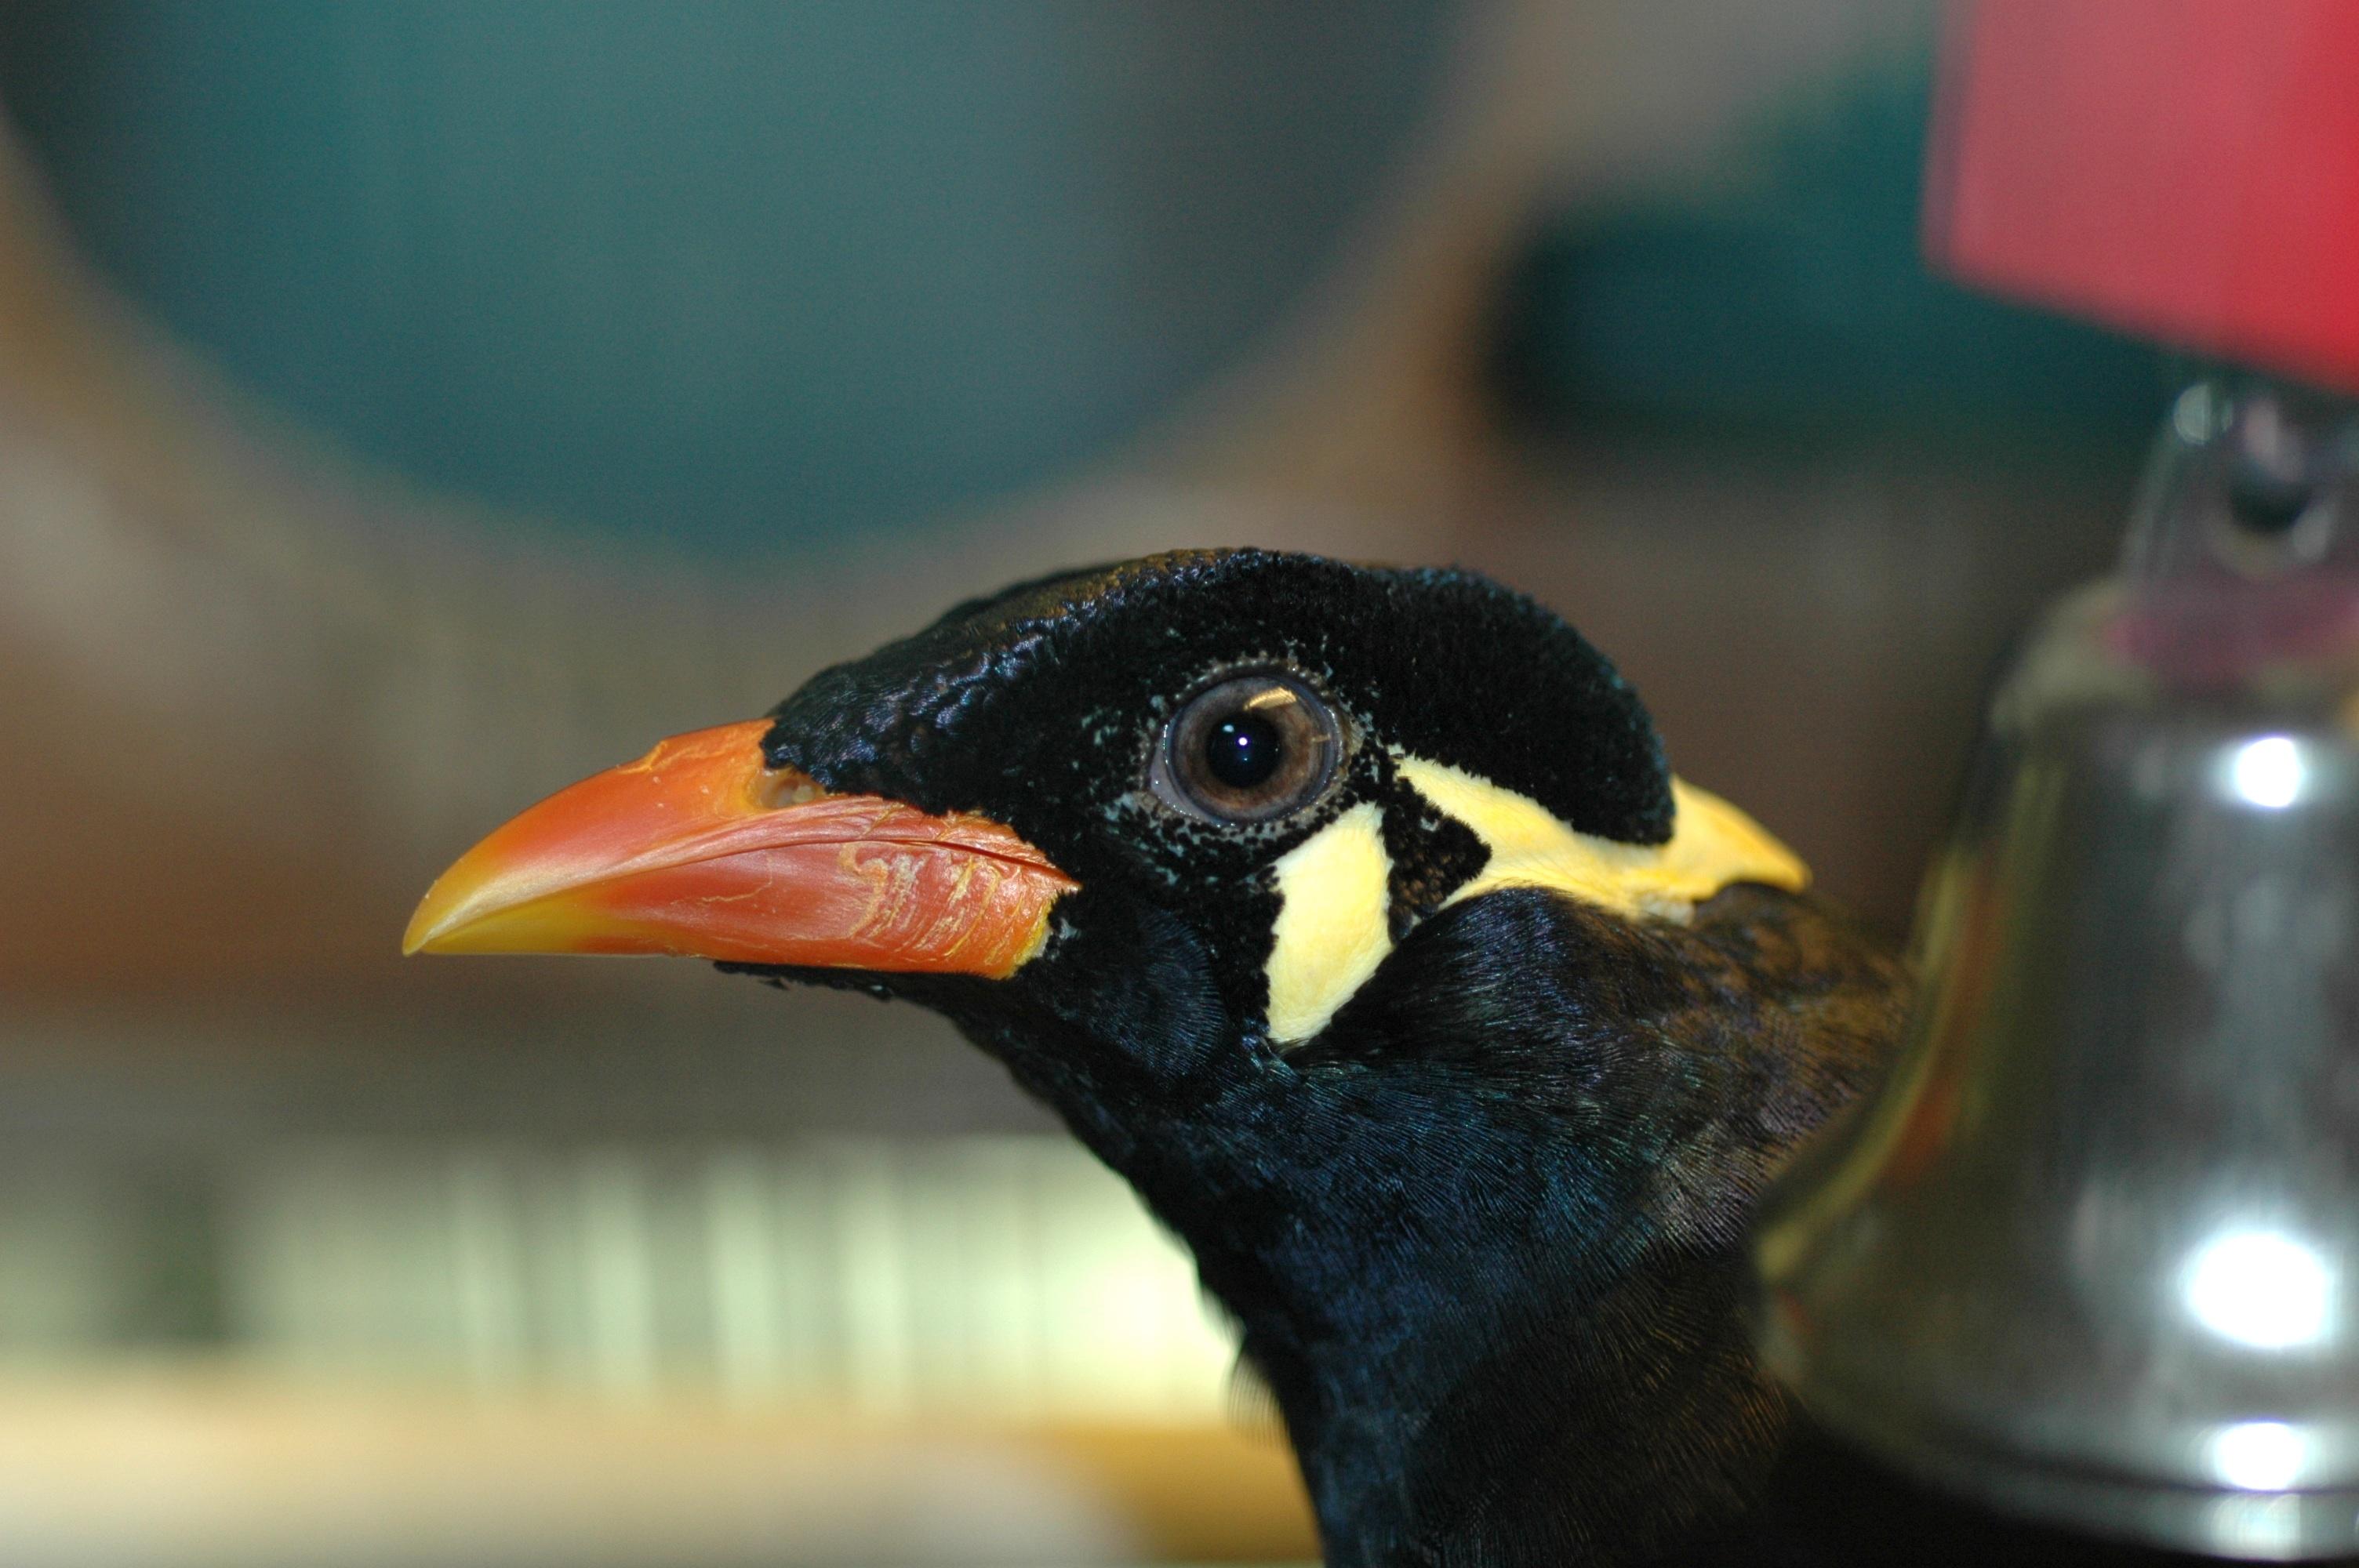 Myna Bird Images File:myna Bird Younis.jpg